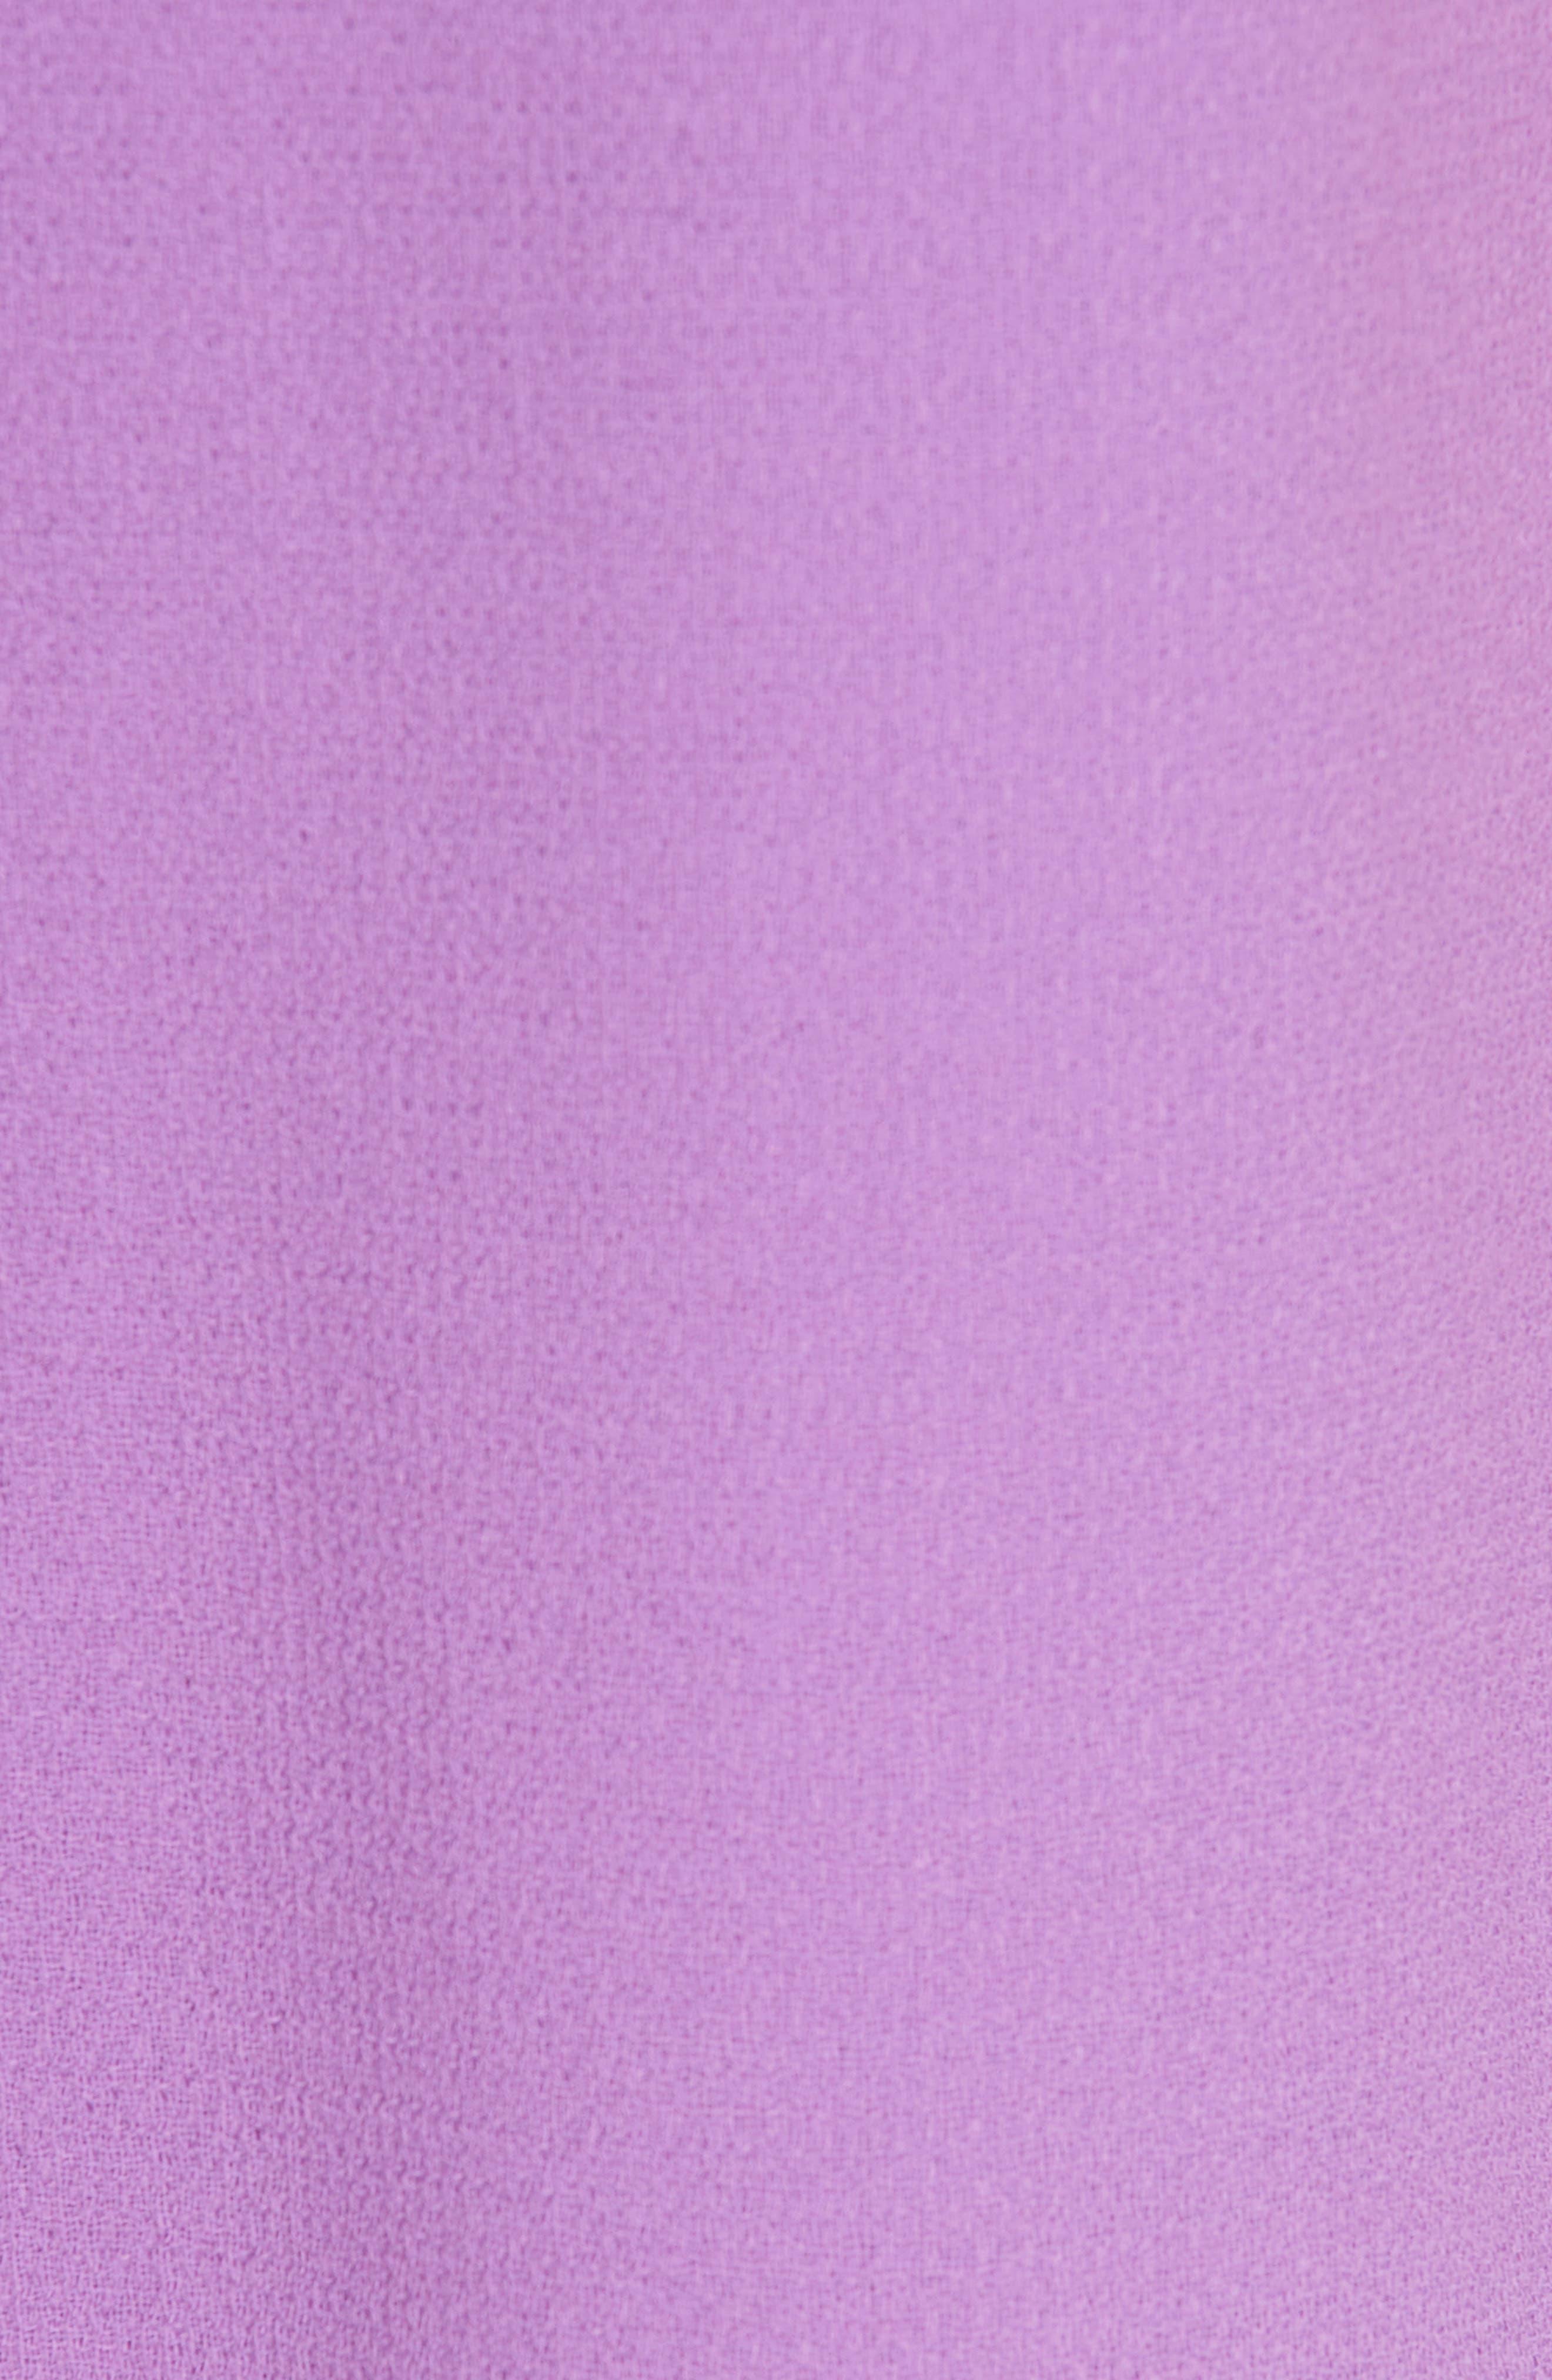 Scarf Neck Wool Blend Crepe Drop Waist Dress,                             Alternate thumbnail 8, color,                             LAVENDER